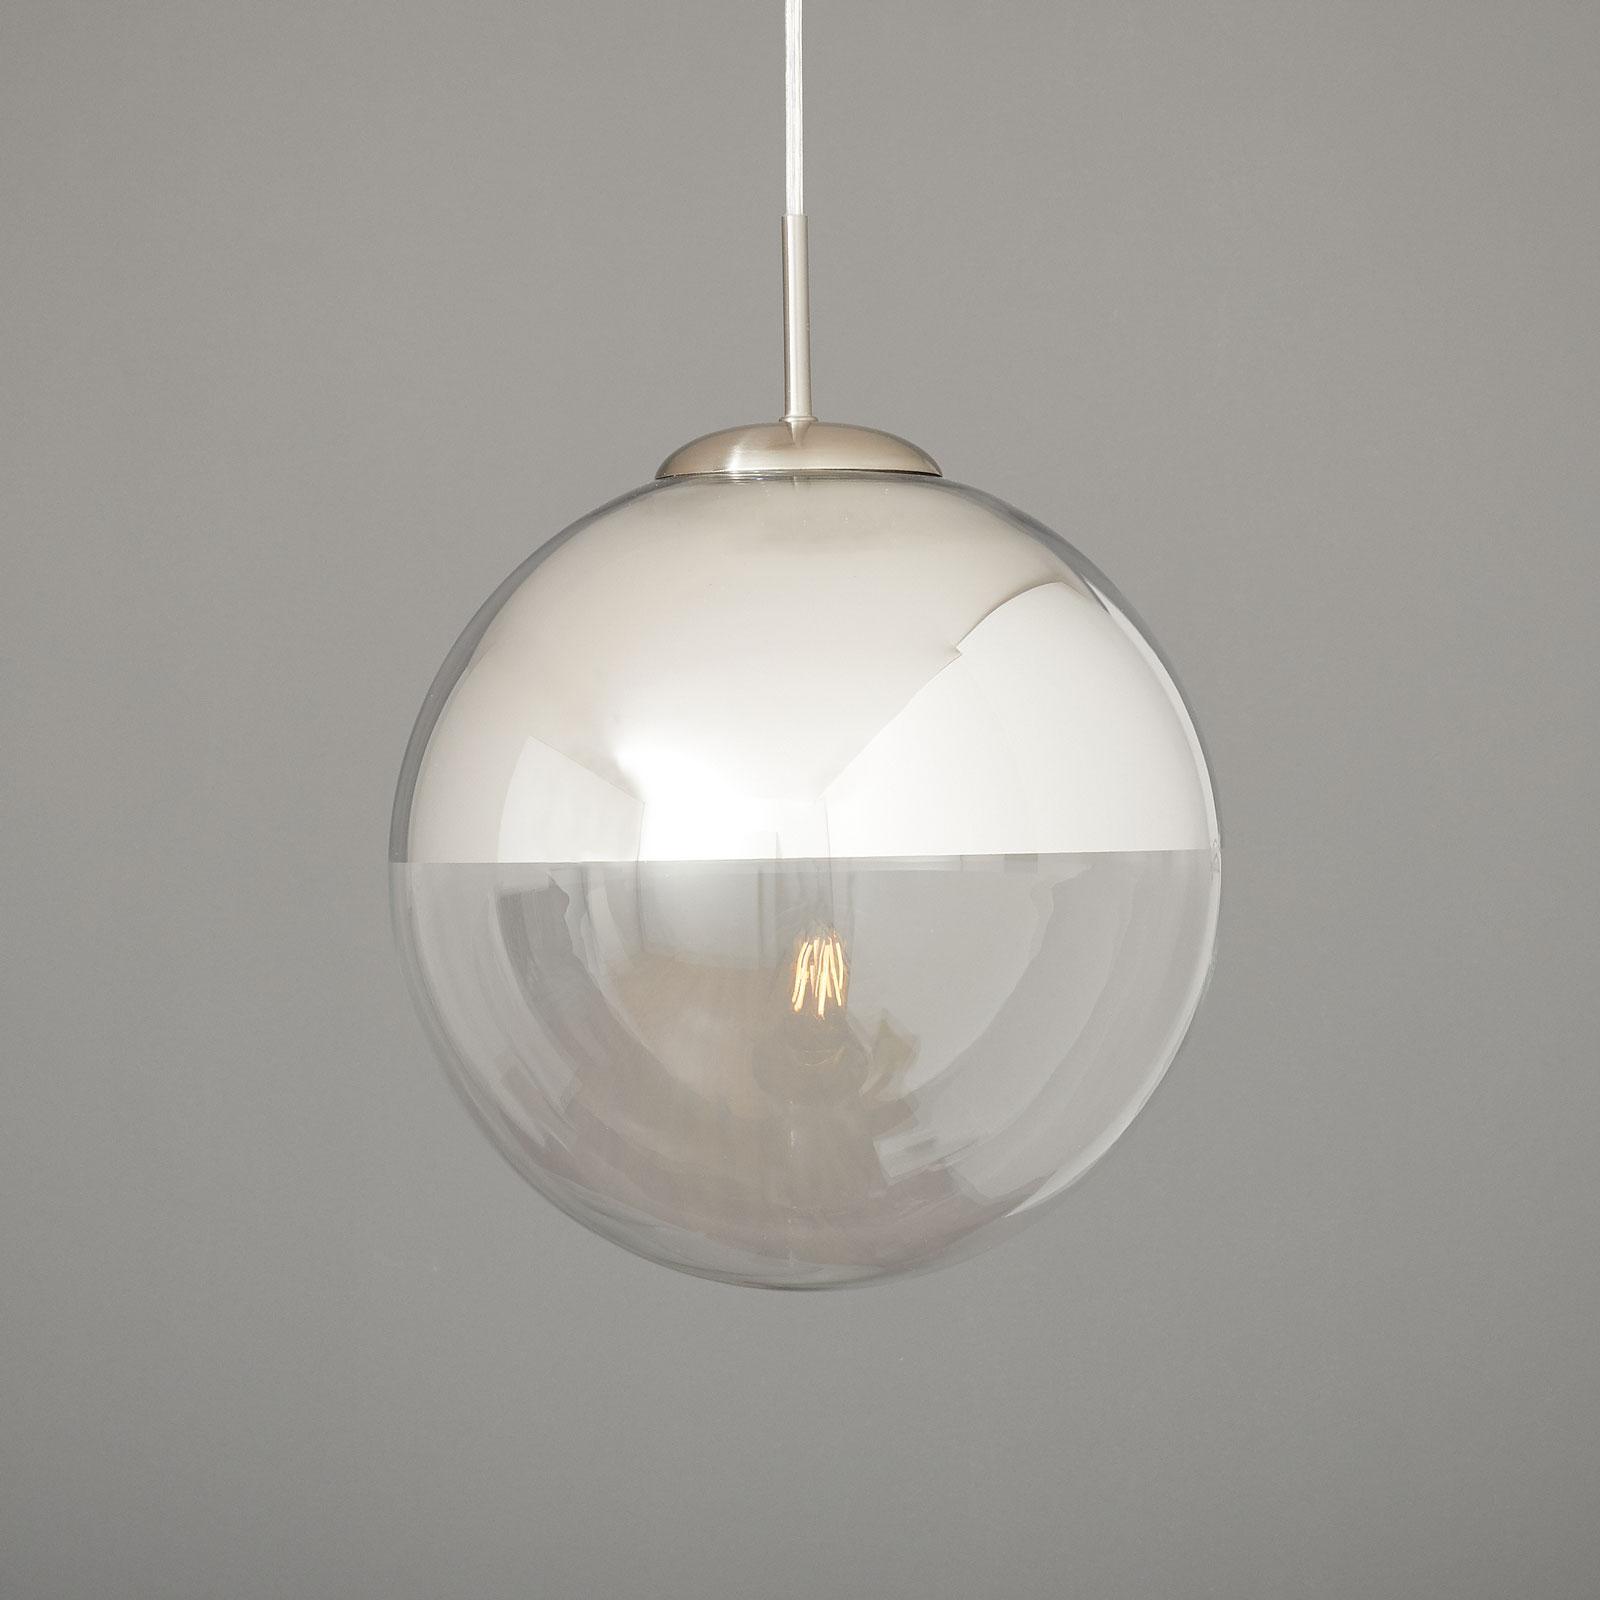 Lámpara colgante Ravena esferas cristal, 1 brazo